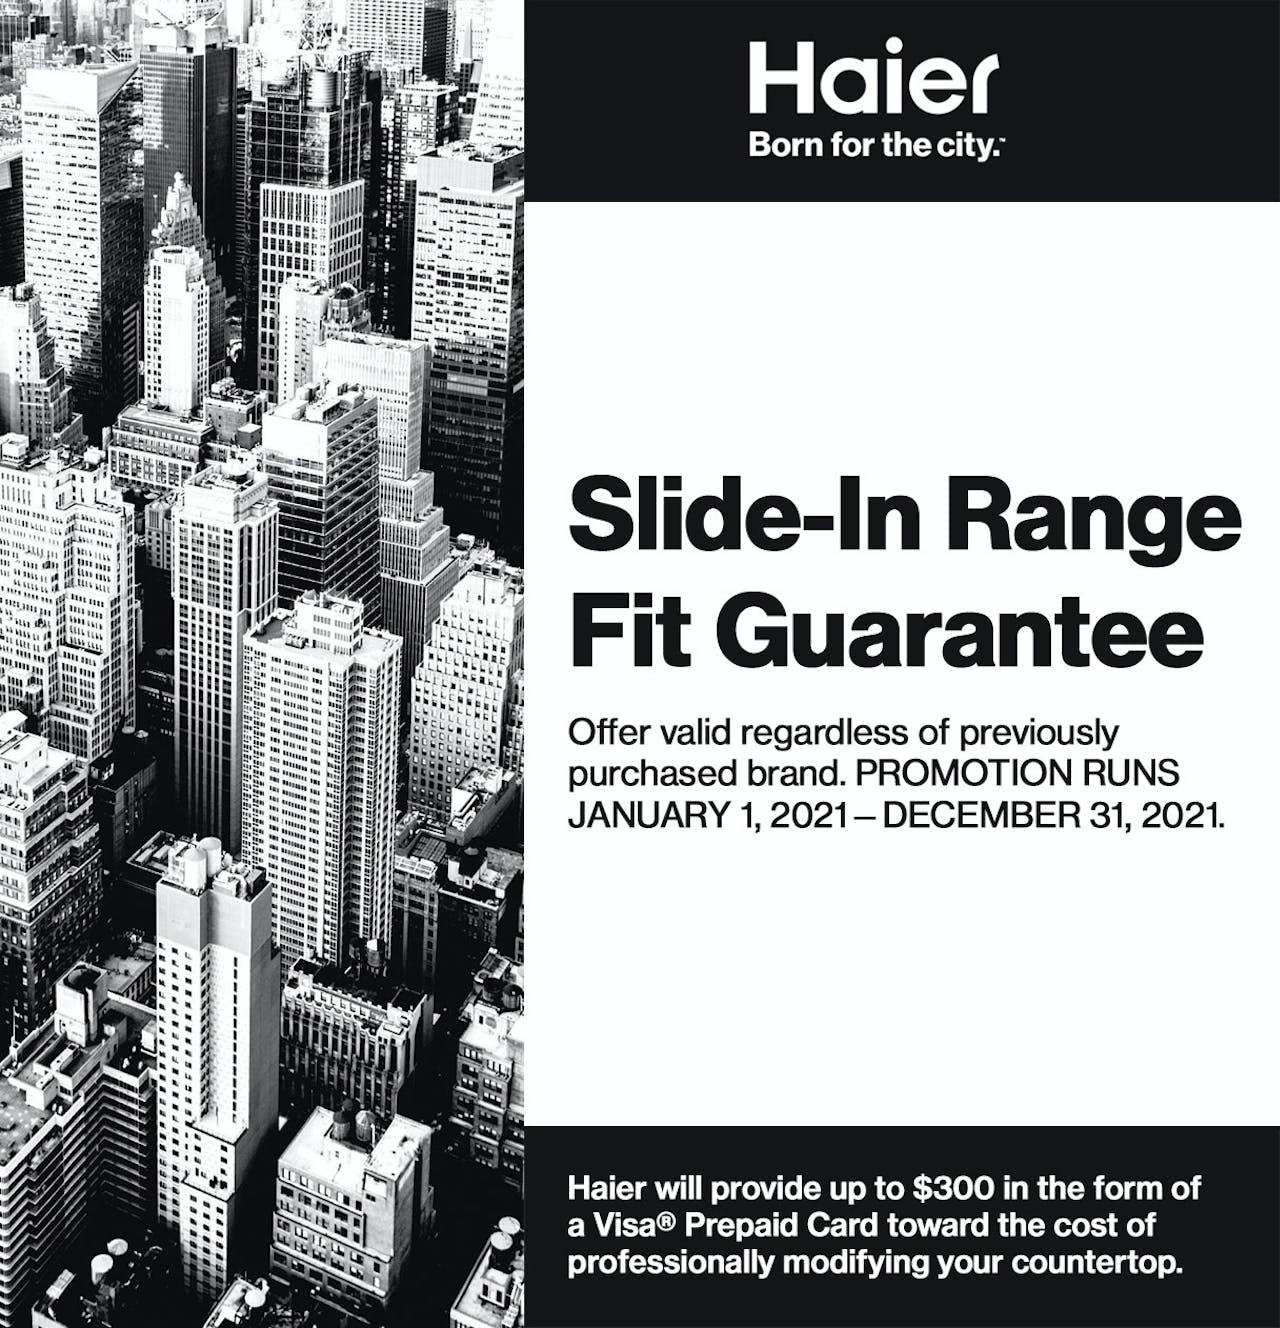 Haier Slide-In Range Fit Guarantee